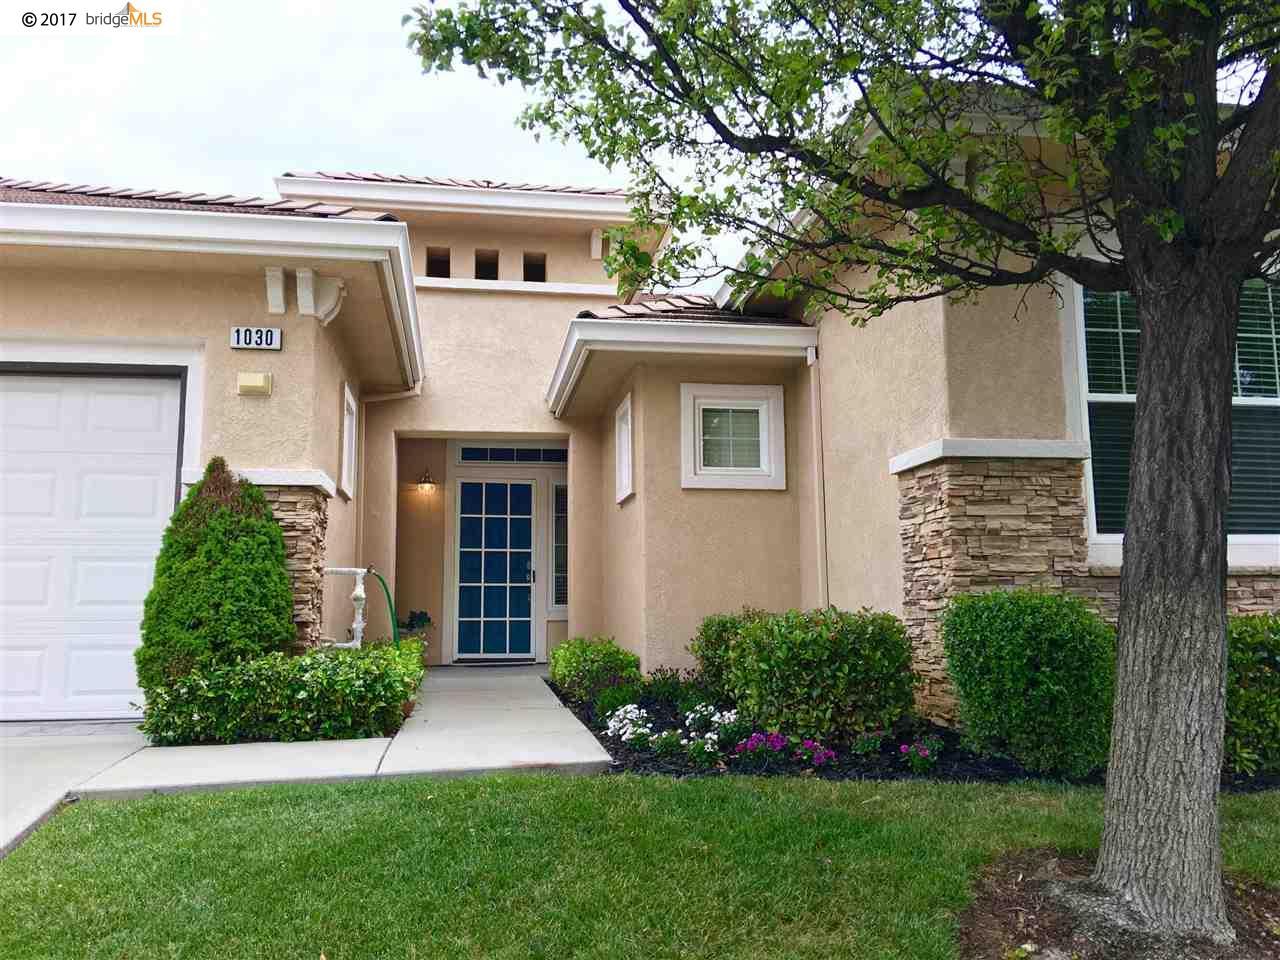 Additional photo for property listing at 1030 BISMARCK TERR  Brentwood, California 94513 Estados Unidos